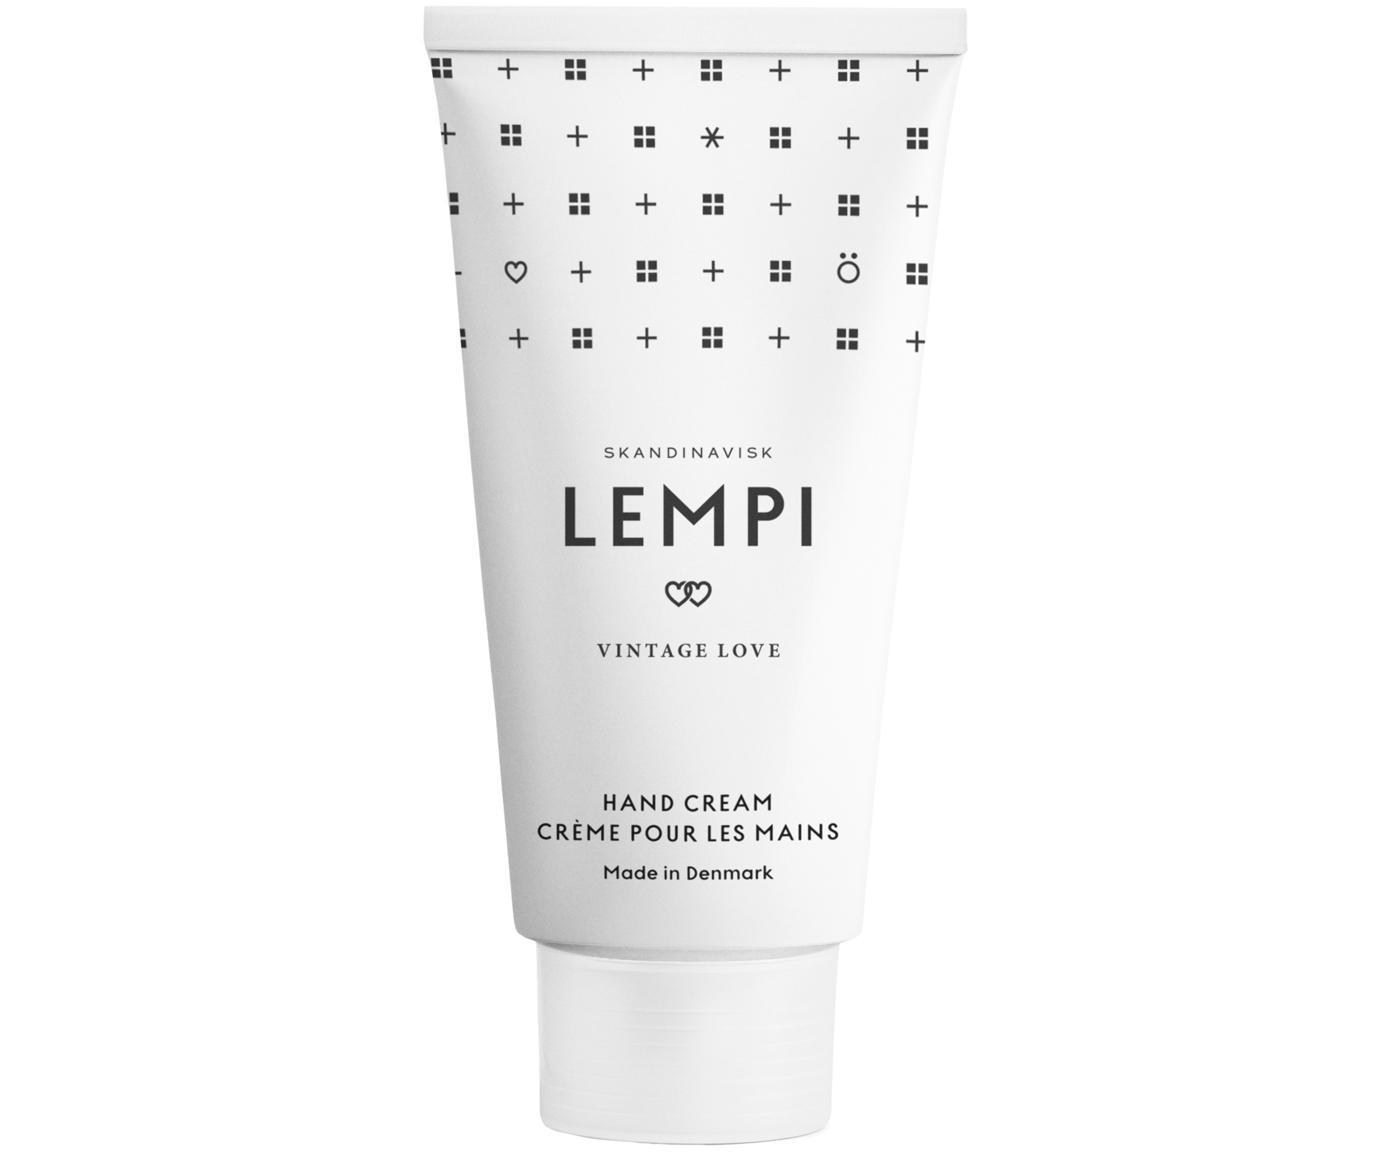 Krem do rąk Lempi (róża), Biały, 75 ml